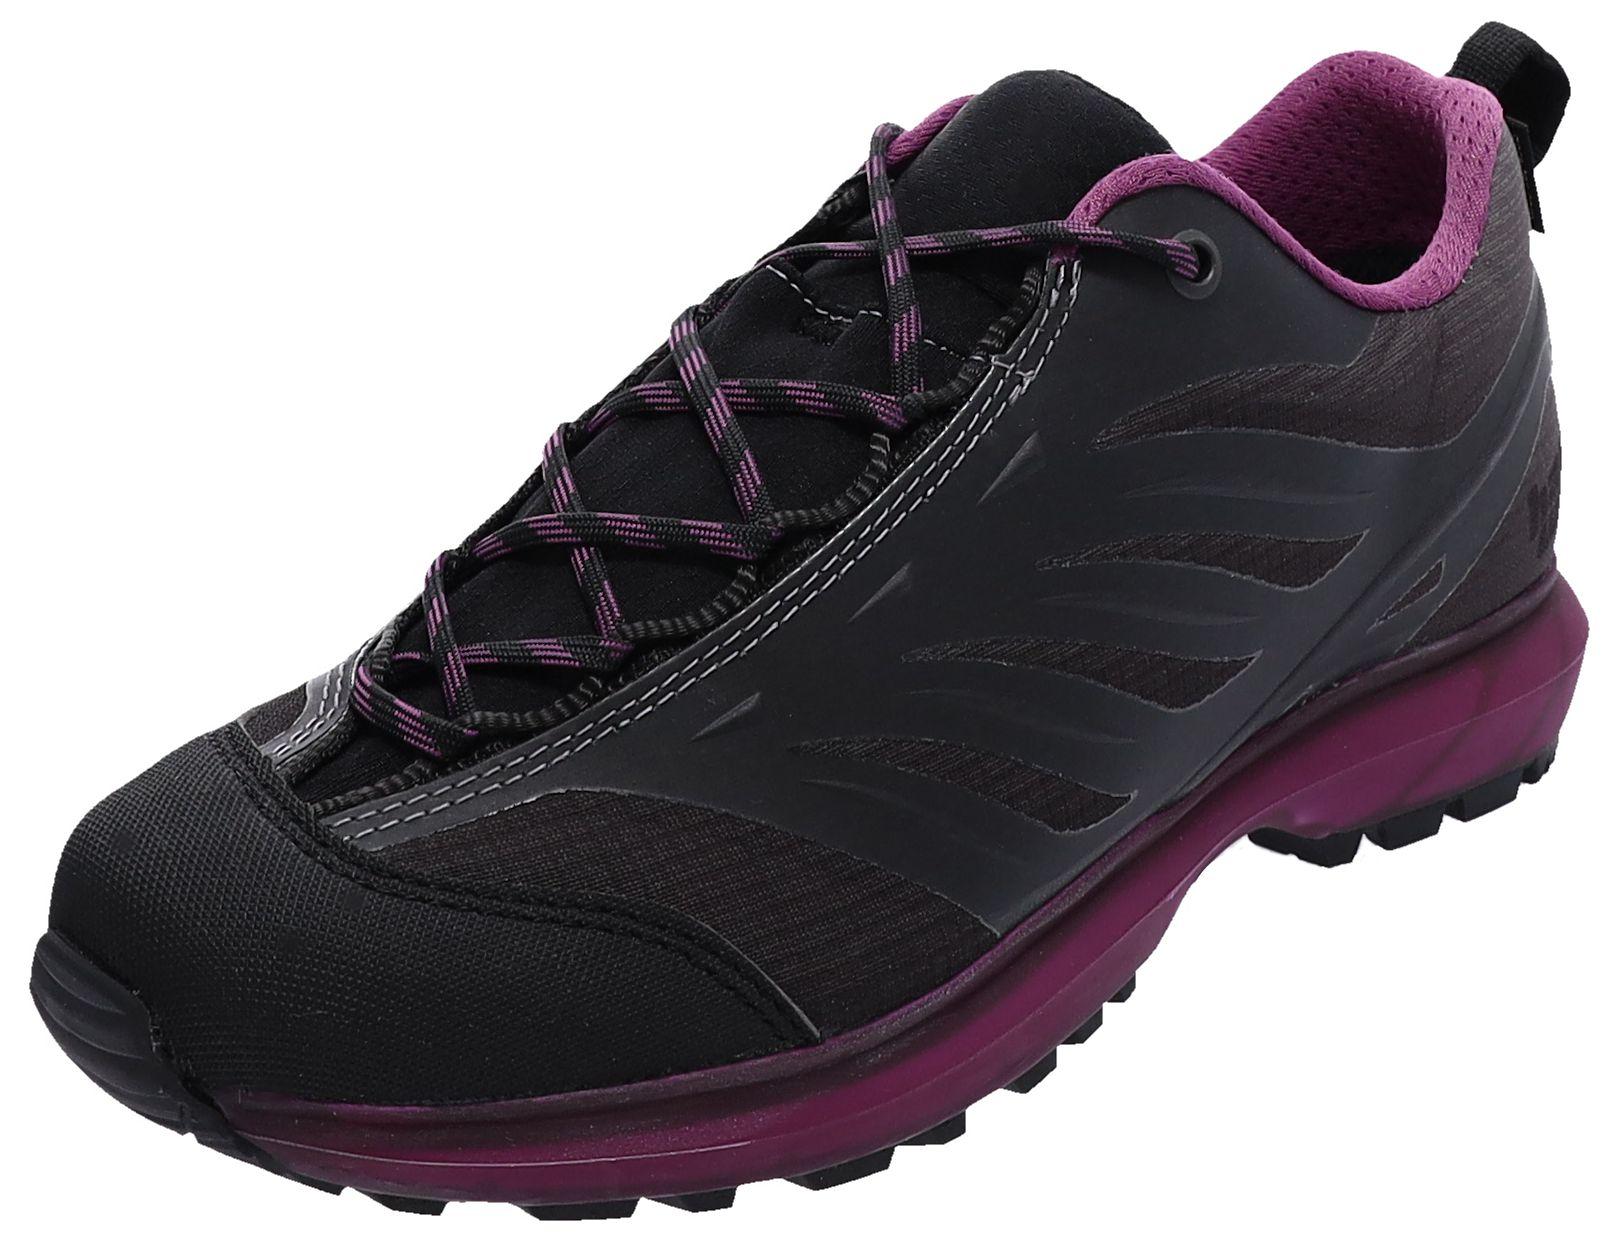 Hanwag EVORADO LOW LADY GTX Asphalt Berry Damen Hikingschuhe Grau günstig online kaufen